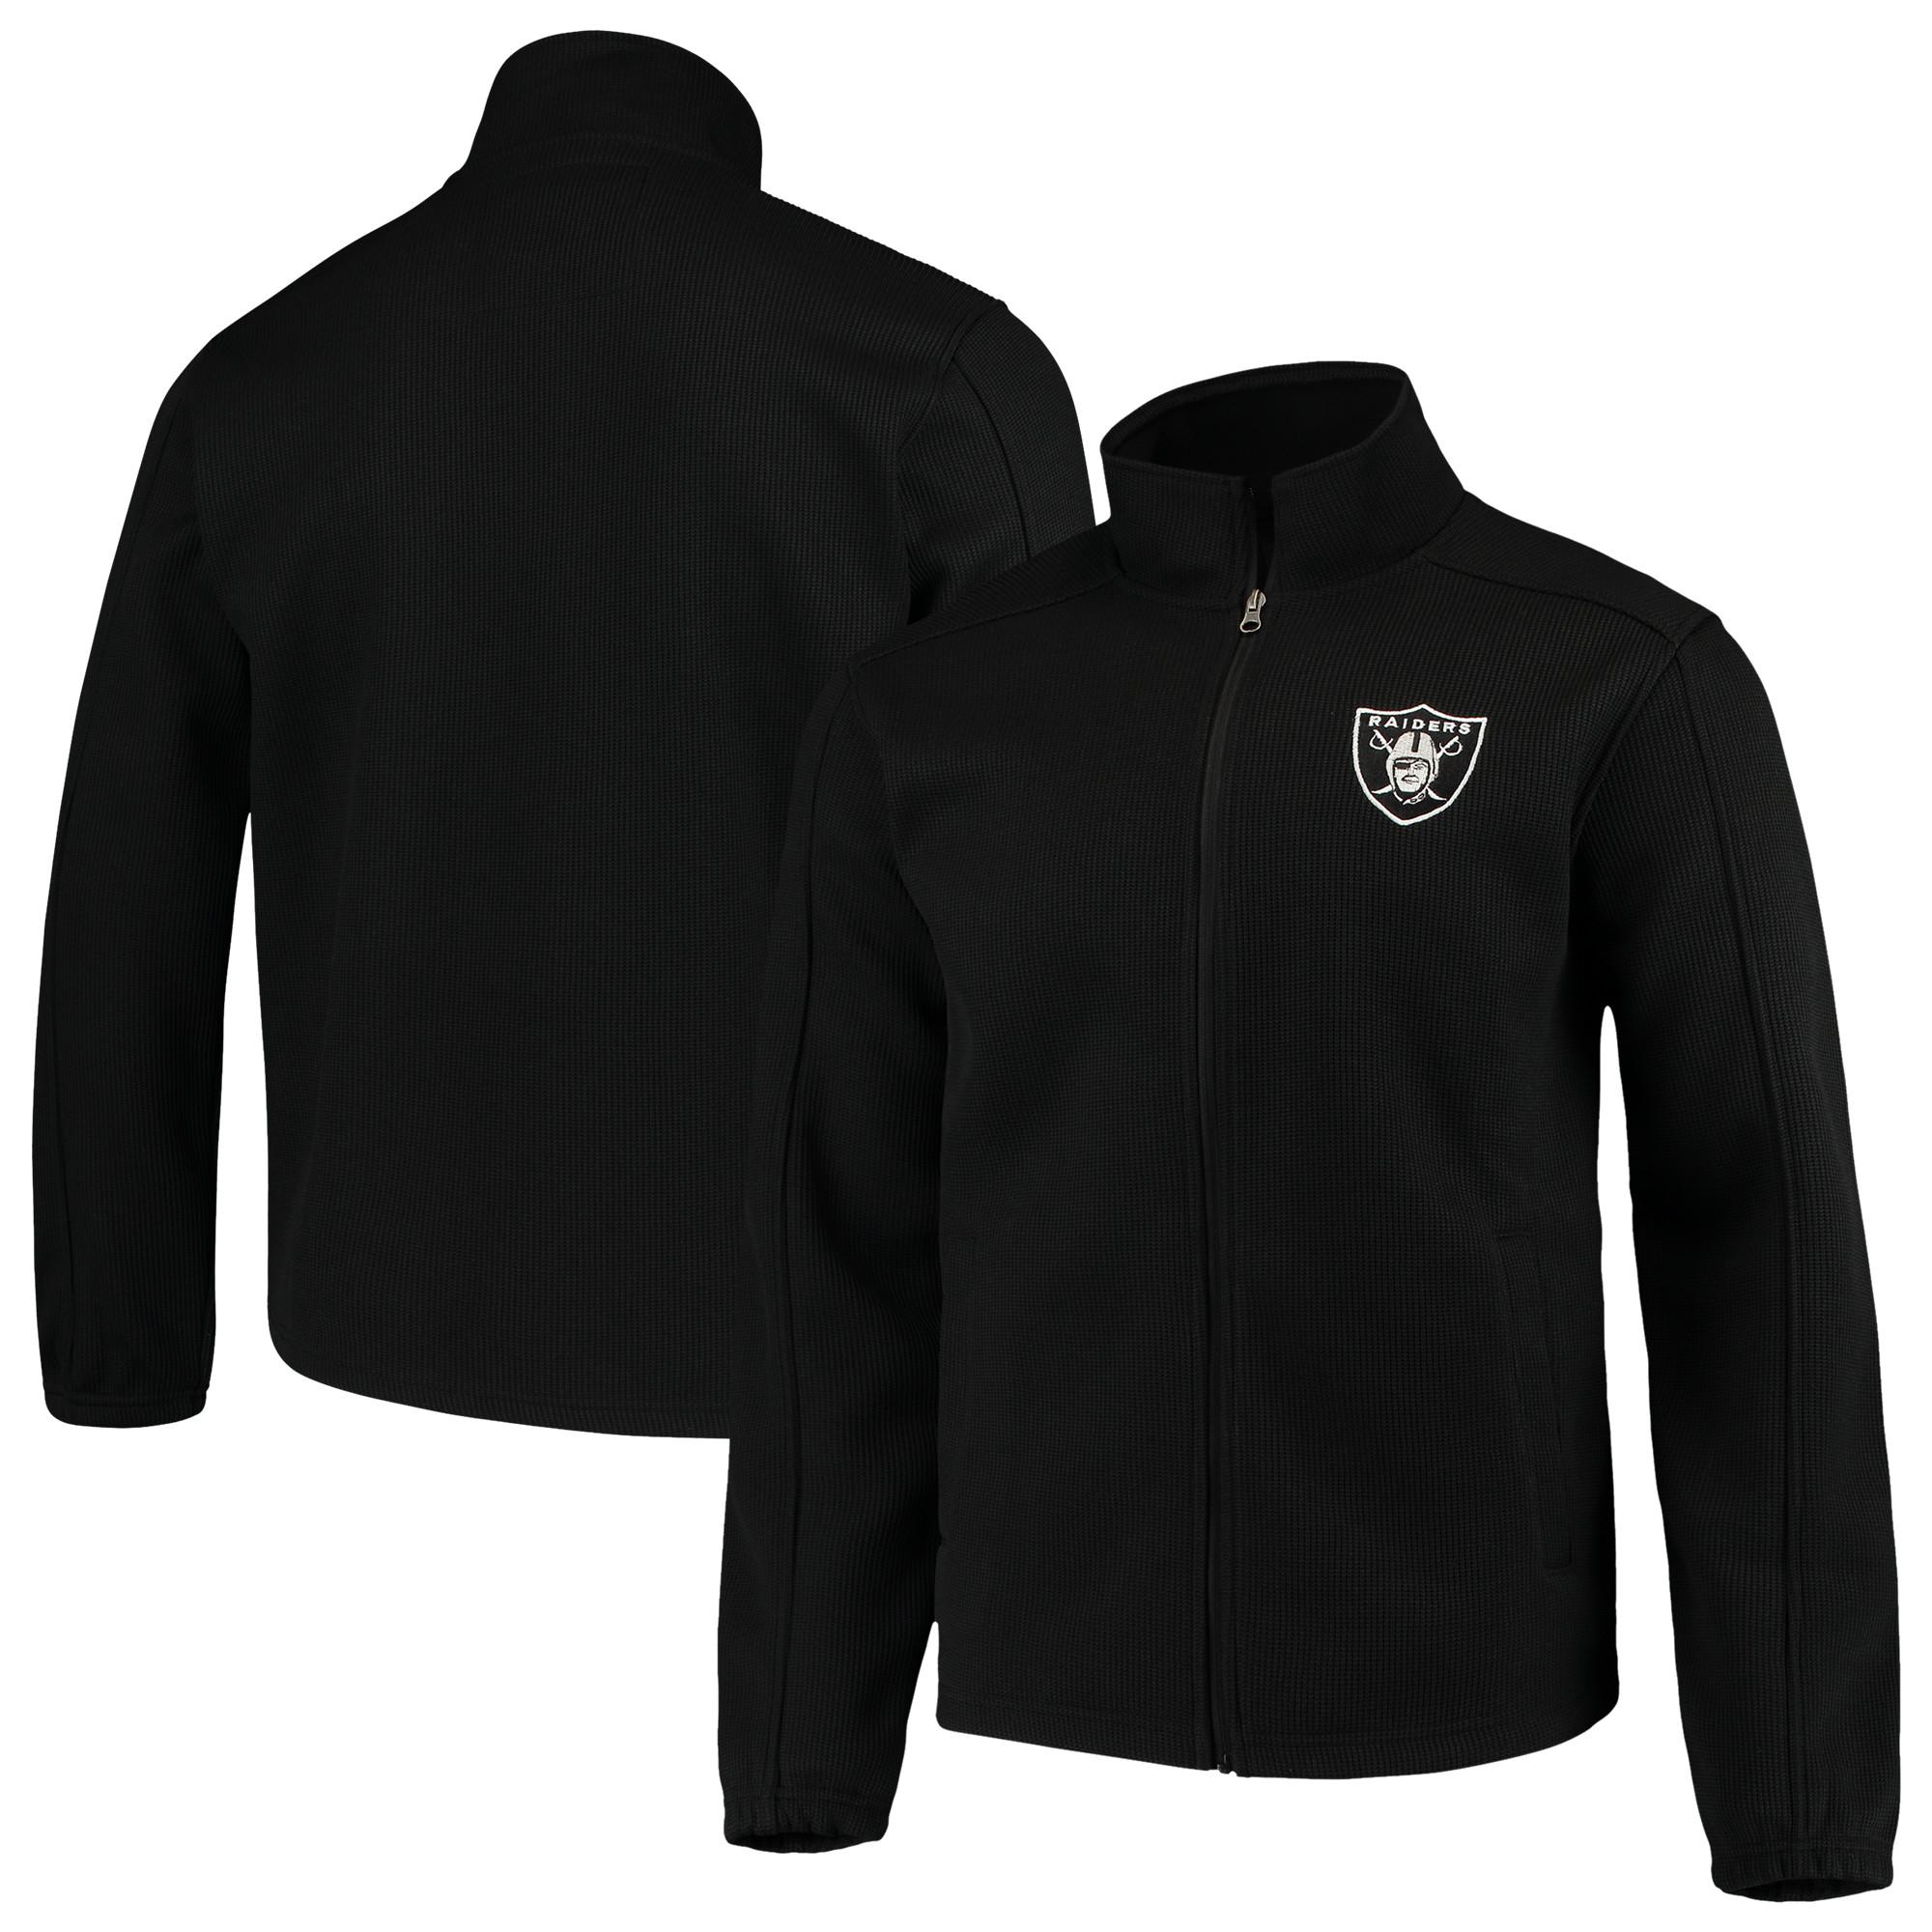 Oakland Raiders G-III Sports by Carl Banks QR Audible Full-Zip Fleece Jacket - Black